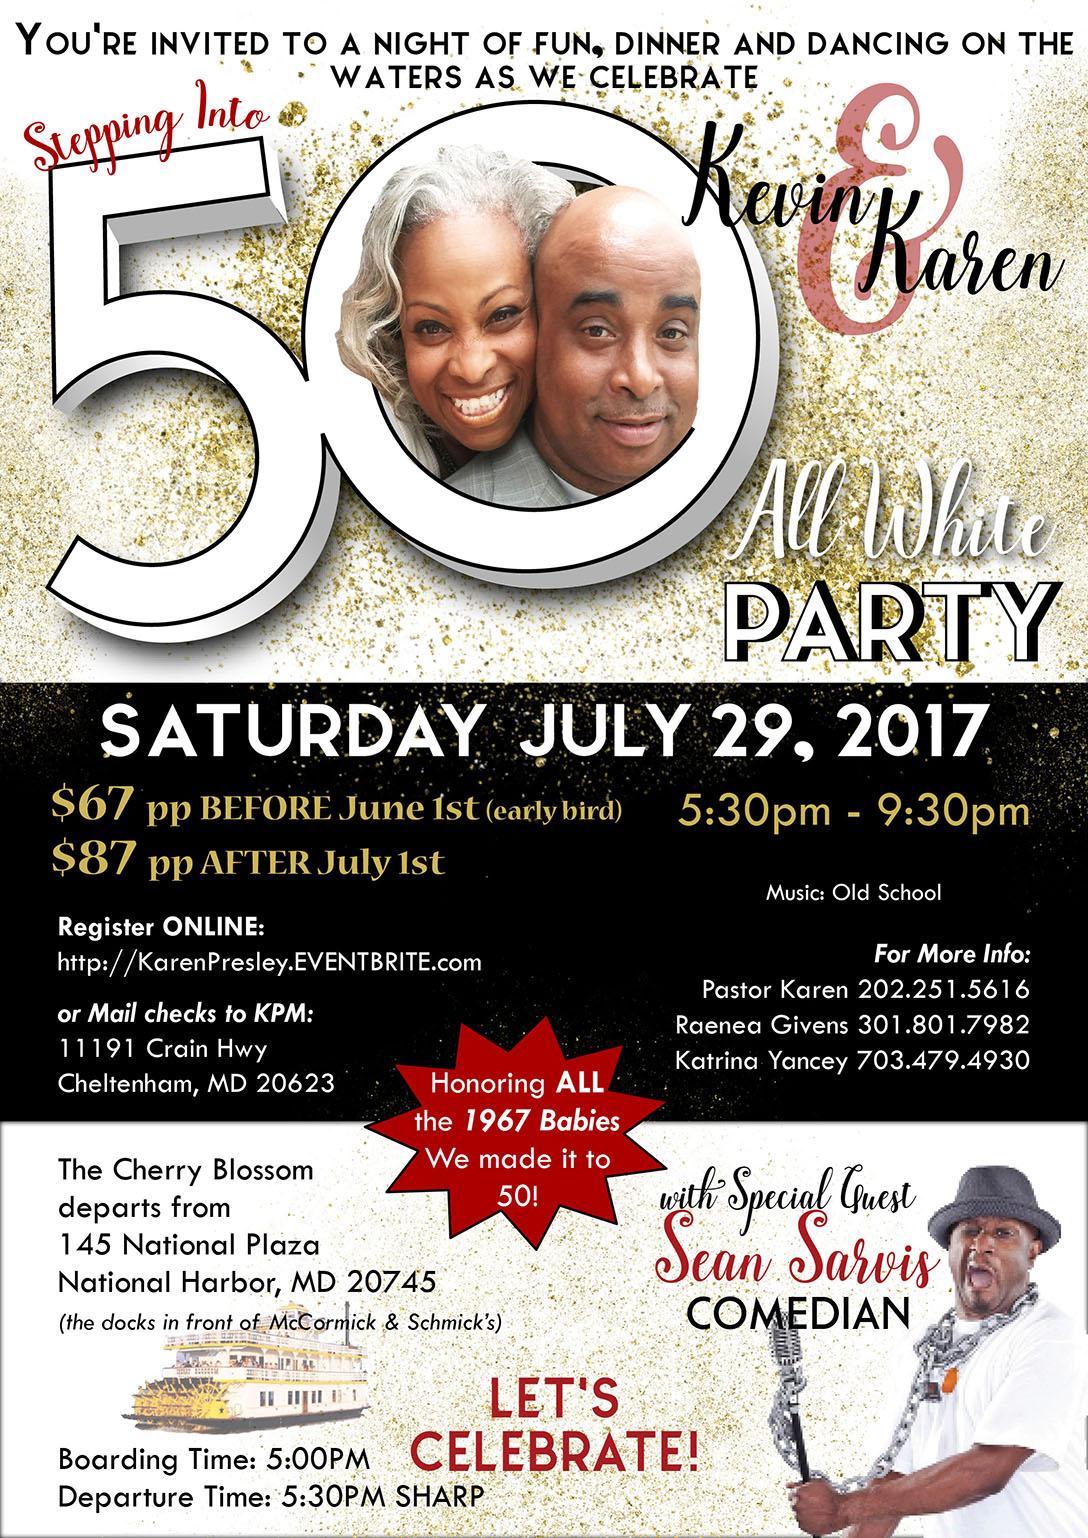 Kevin_Karen 50th Birthday Celebration